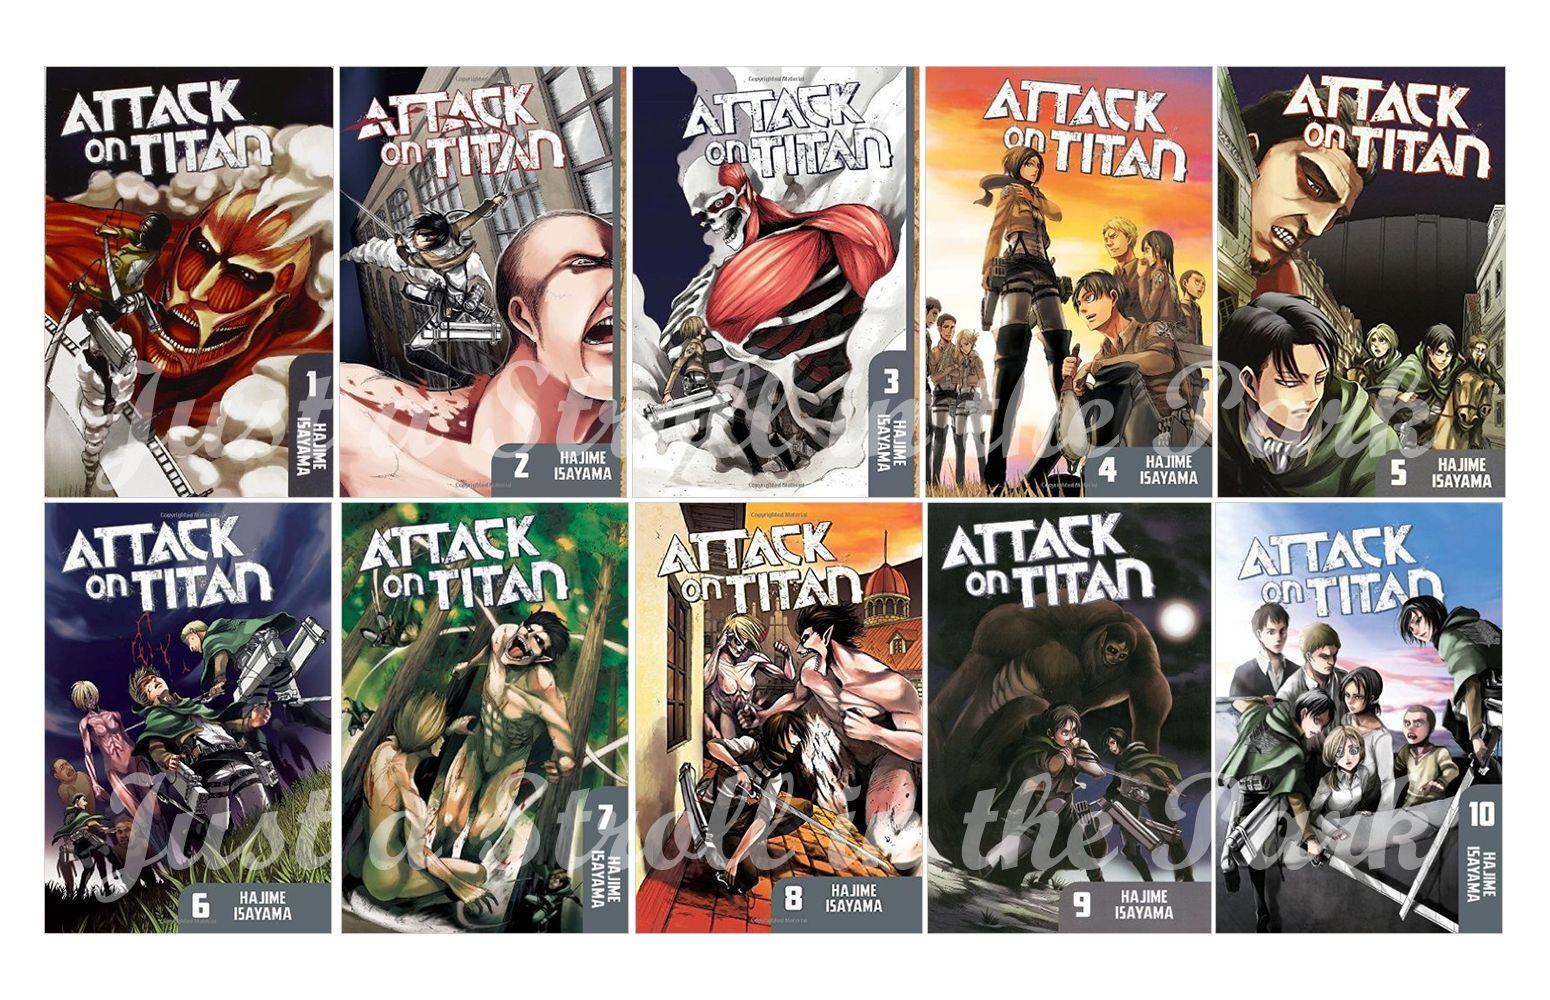 Attack on titan english manga anime graphic novel series complete book 1 10 set